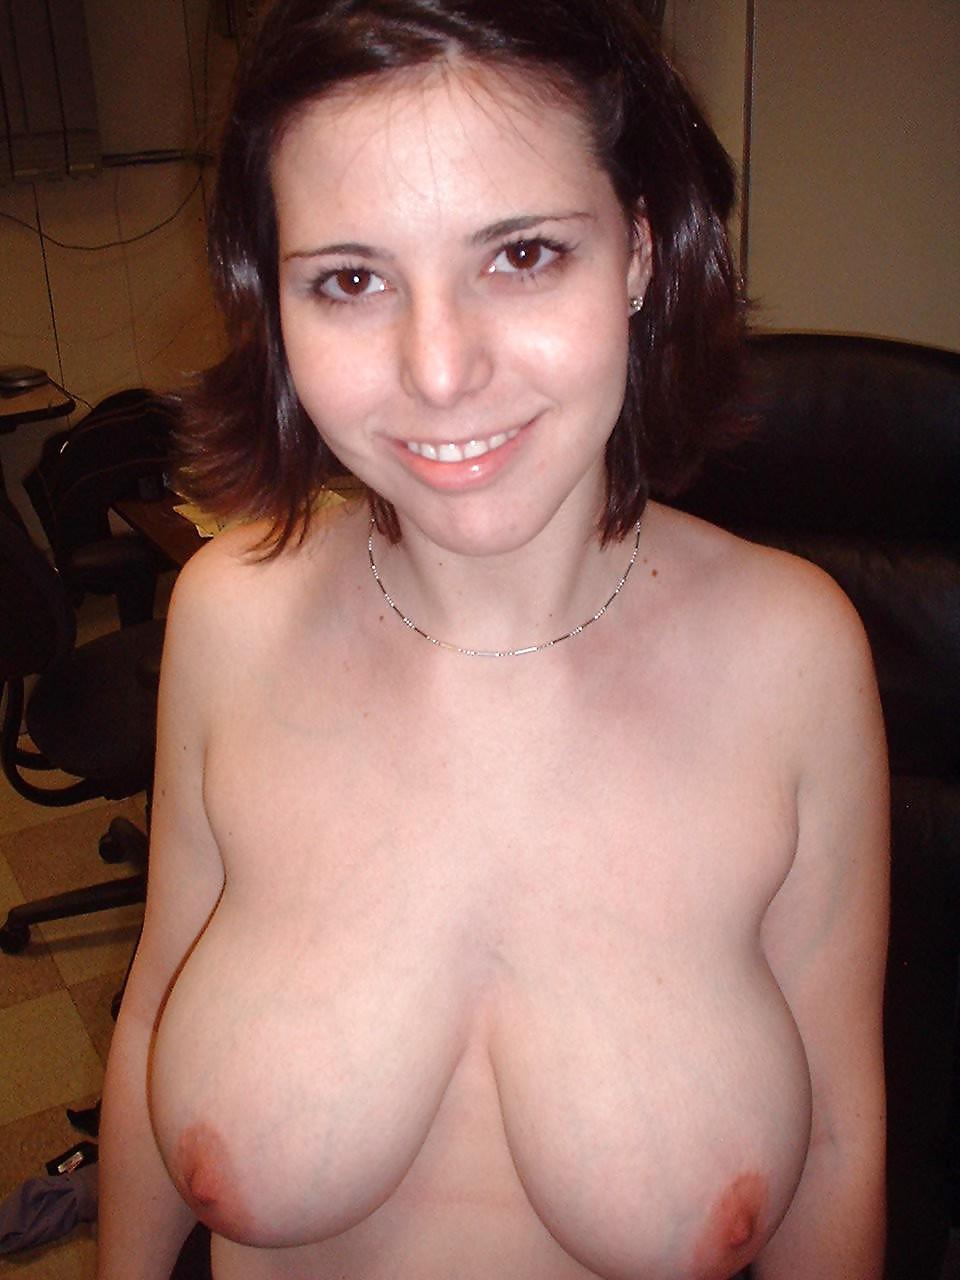 Pornstar stephanie mcmahon nude